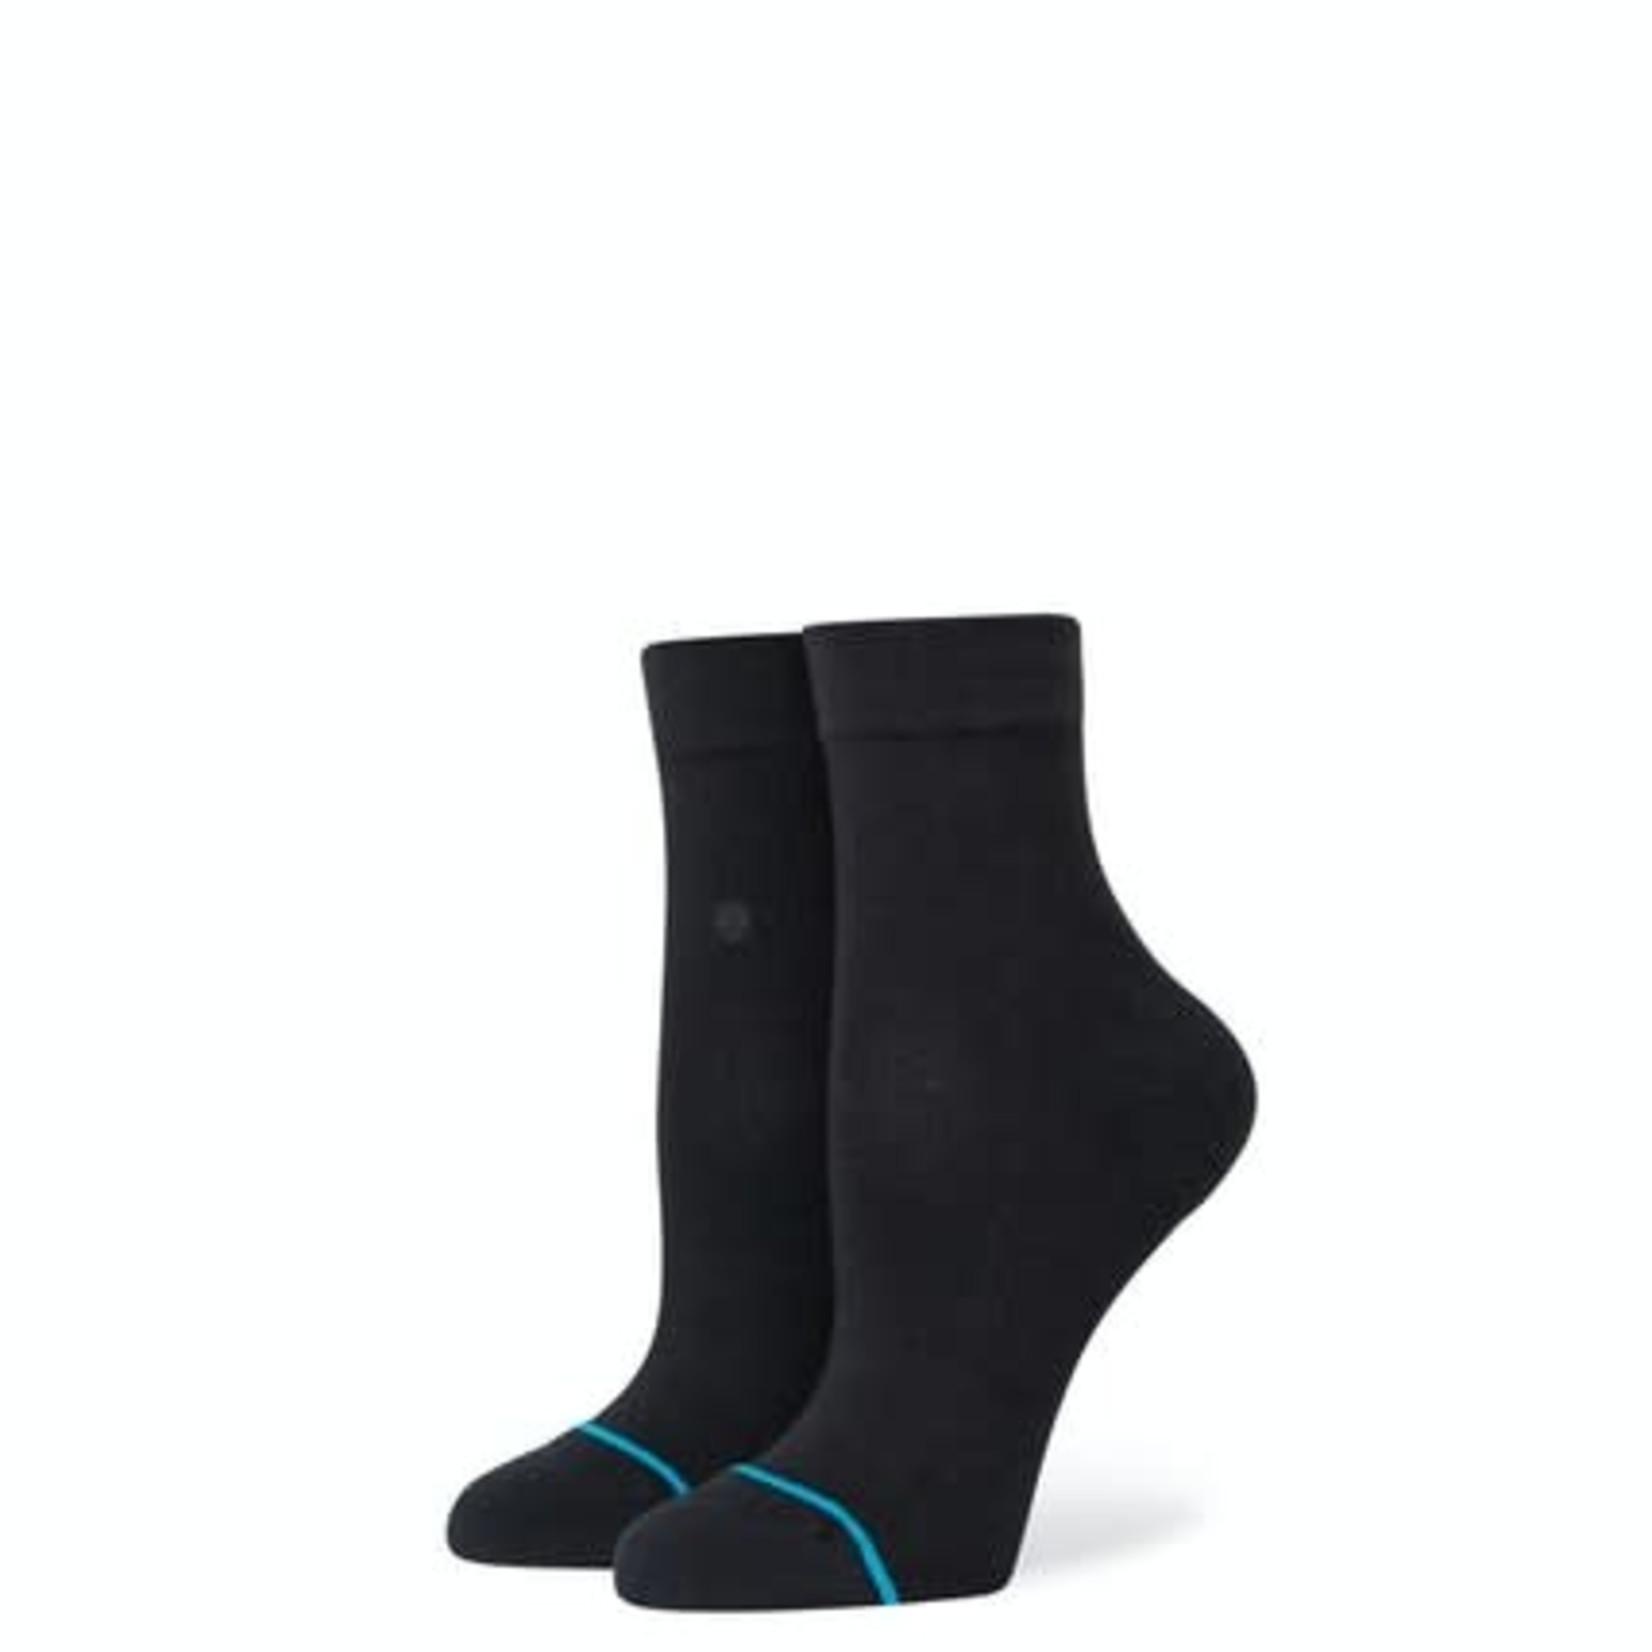 Stance Stance Socks, Lowrider, Ladies